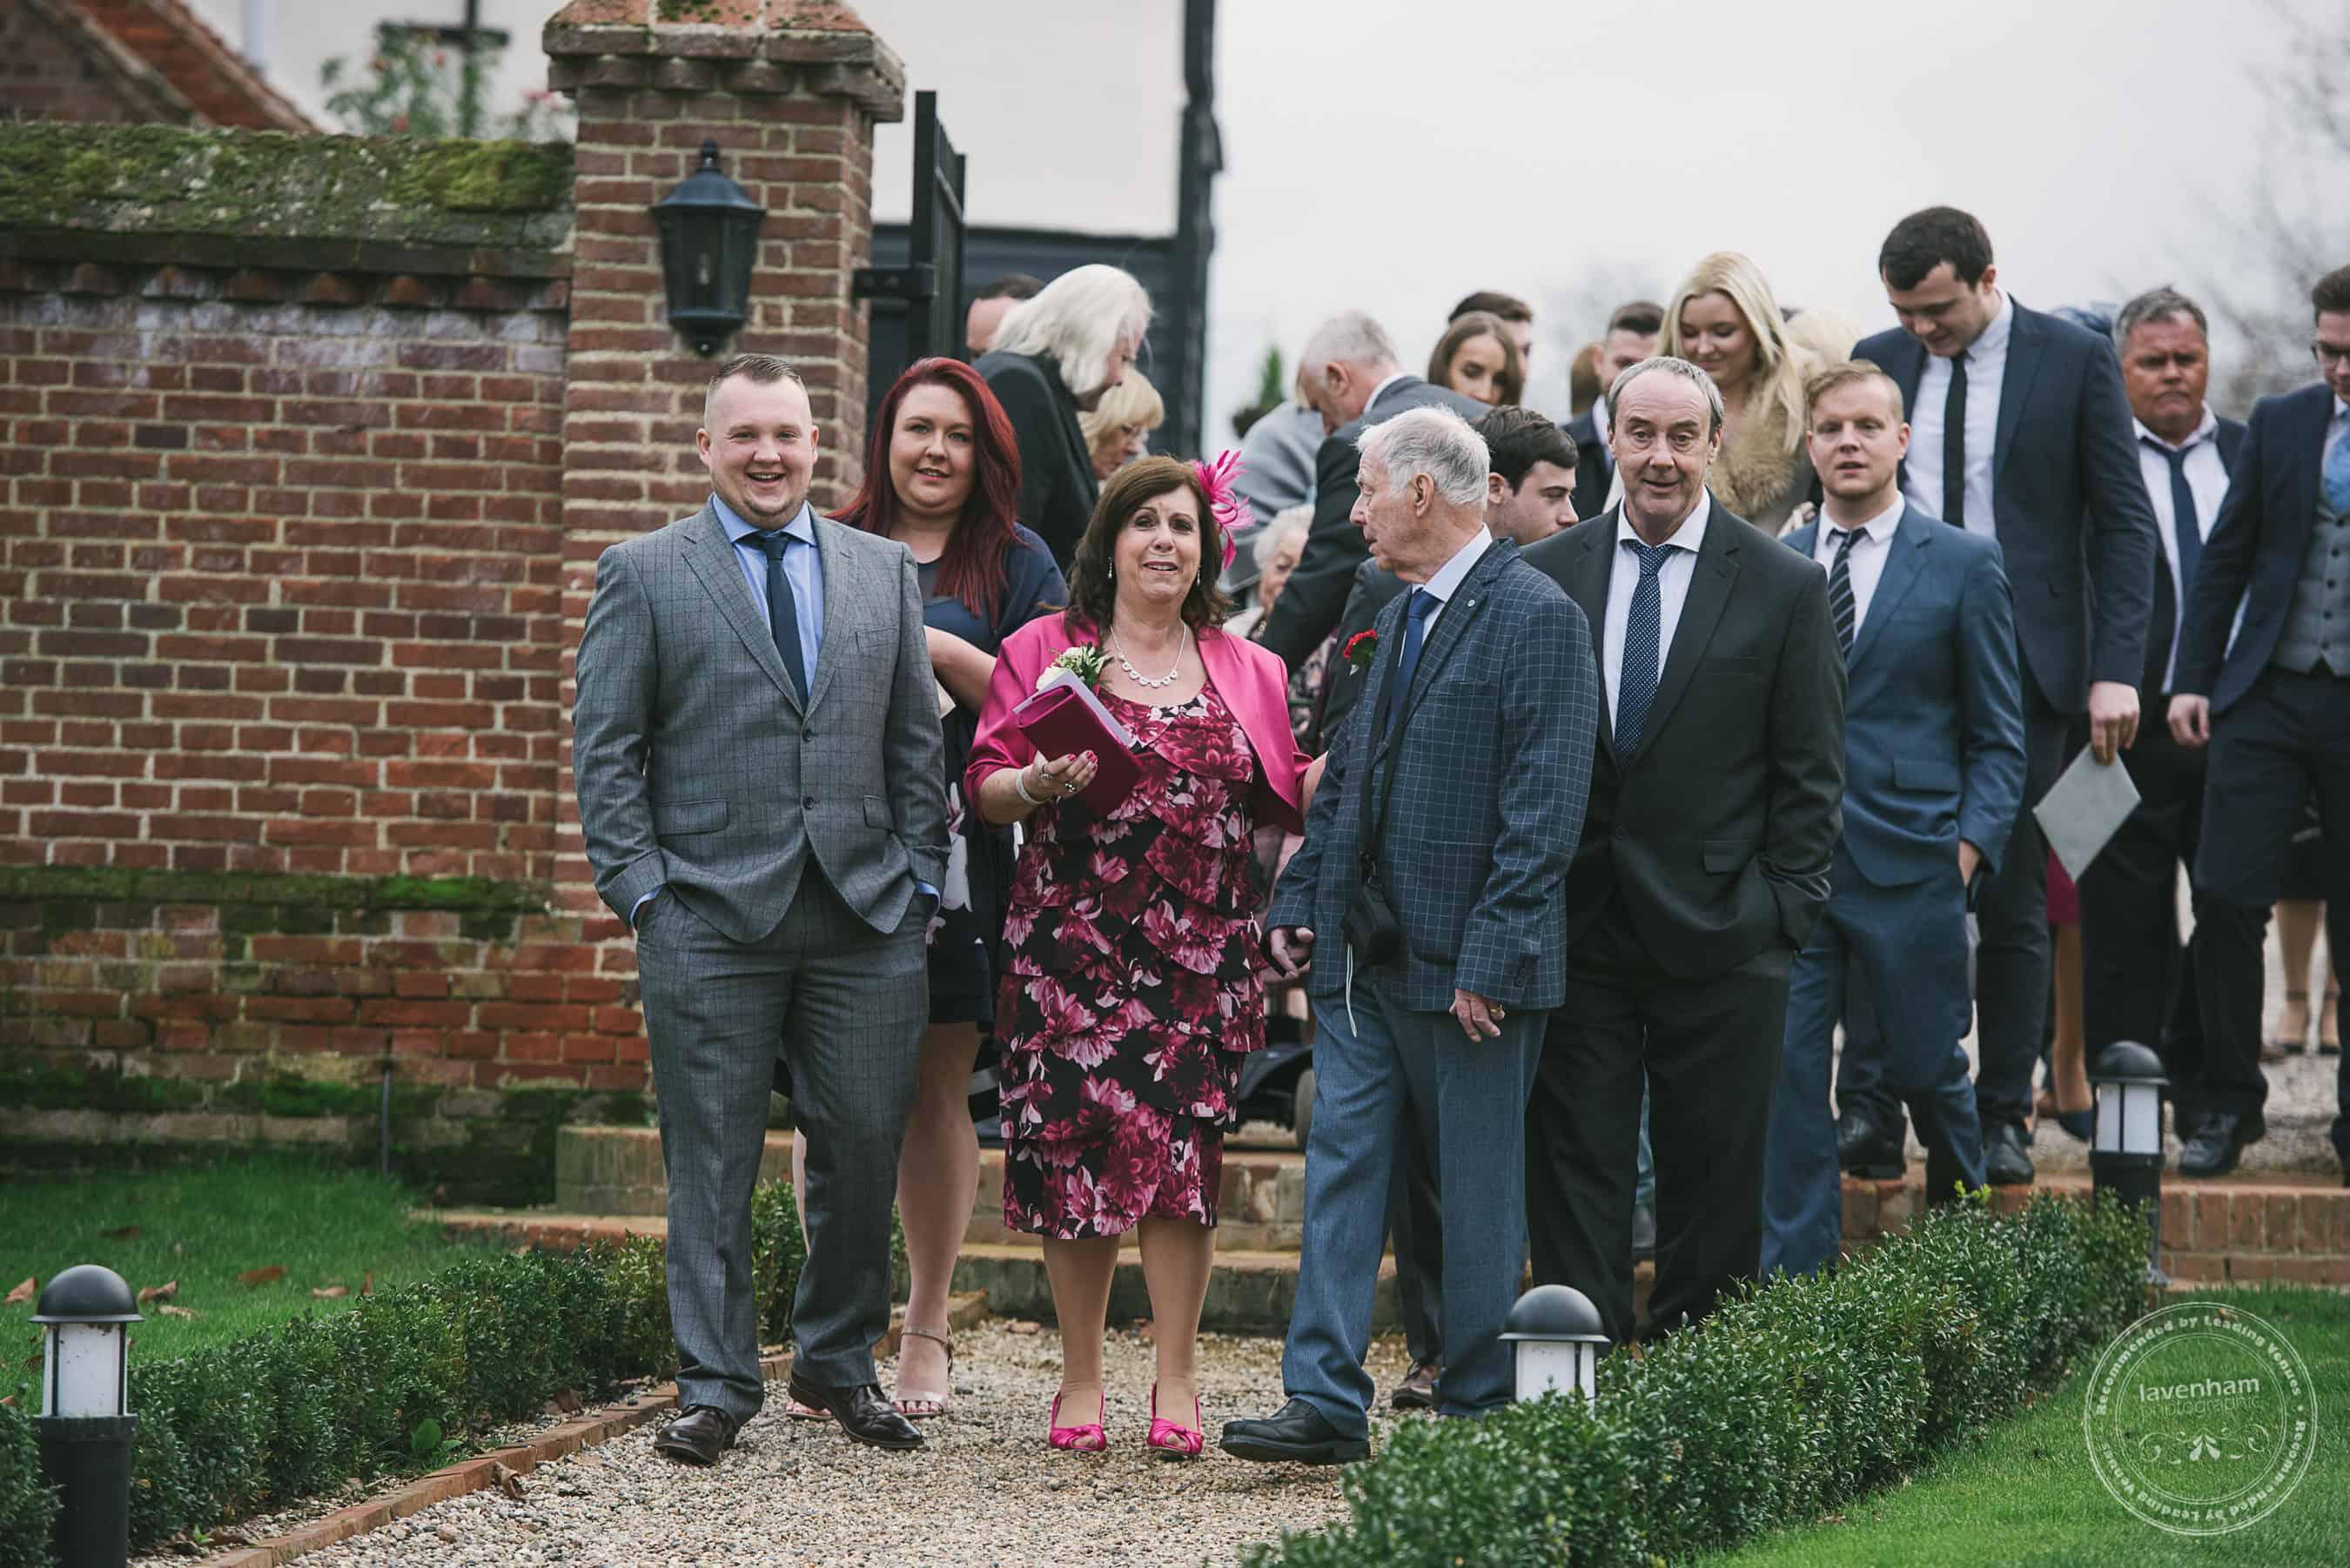 251118 Leez Priory Wedding Photography by Lavenham Photographic 060